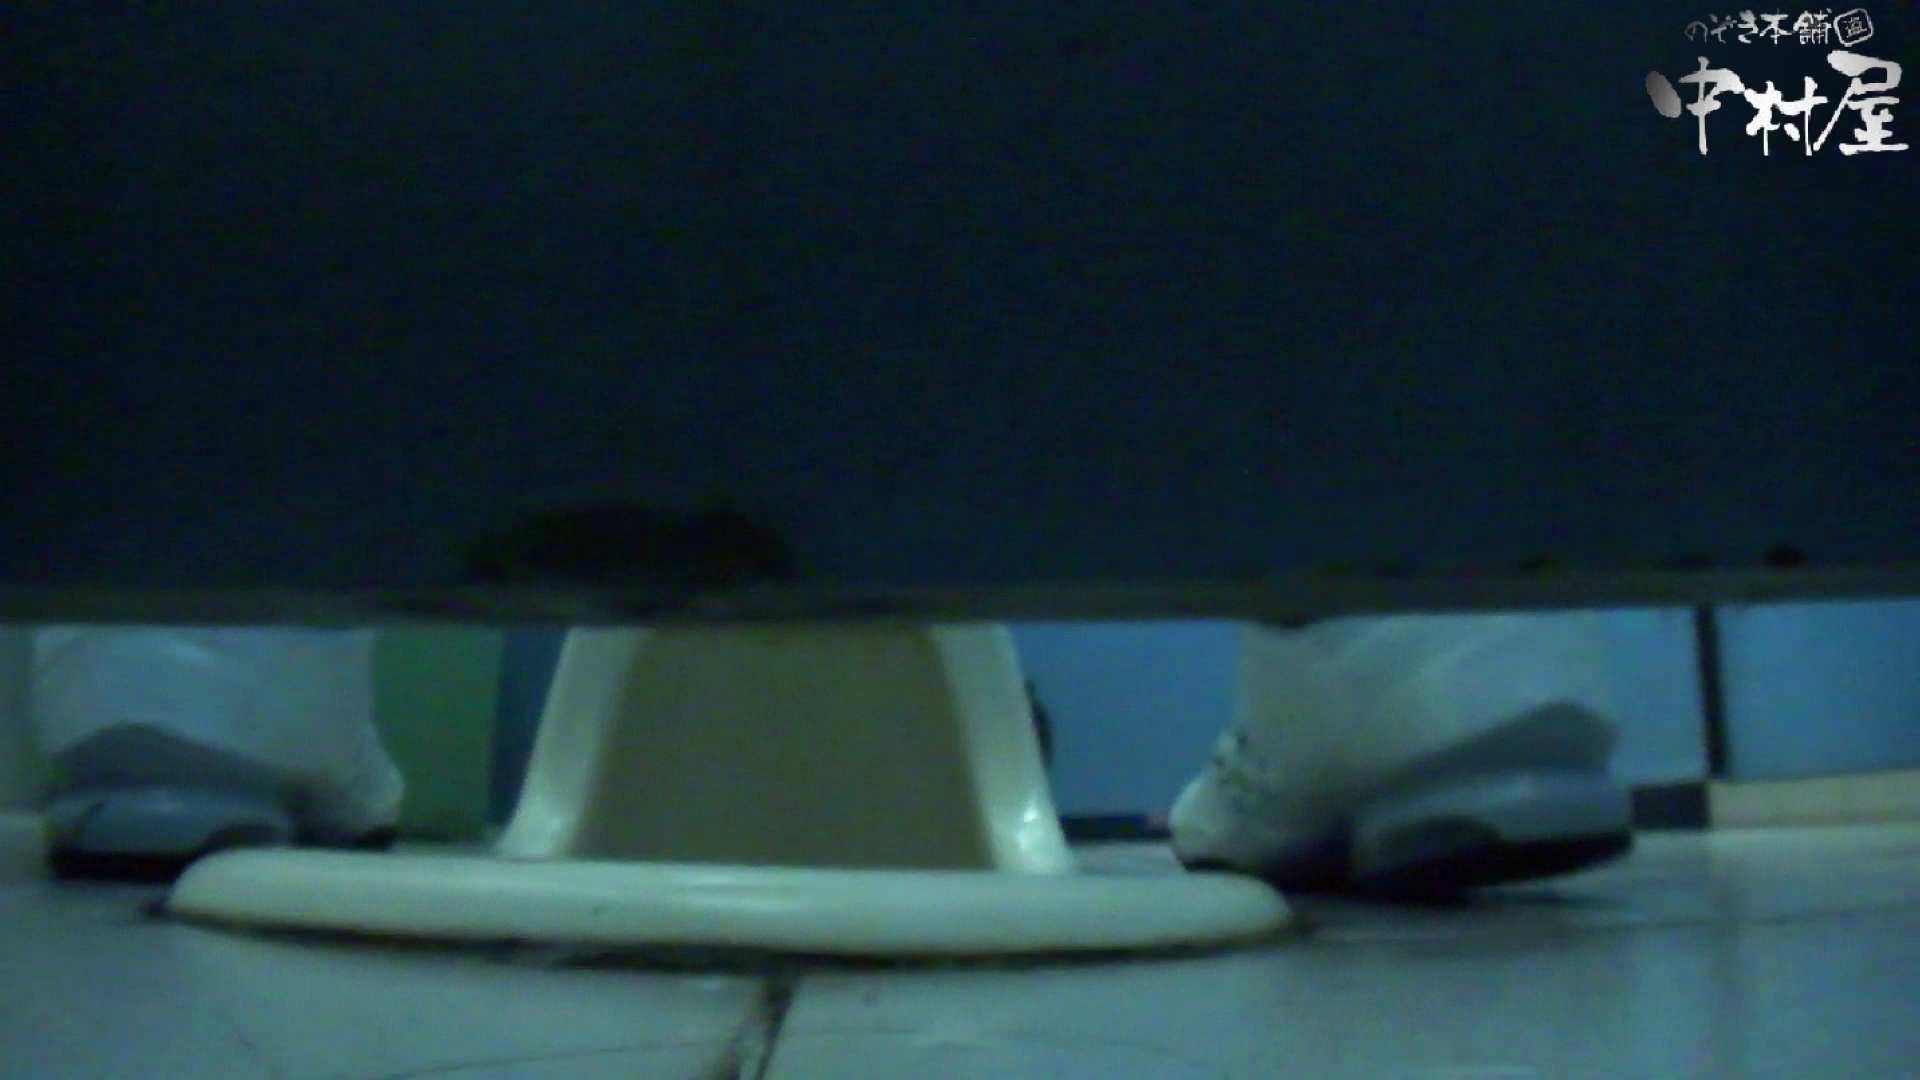 GOD HAND 芸術大学盗撮‼vol.79 OLエロ画像 盗撮ワレメ無修正動画無料 38PICs 2